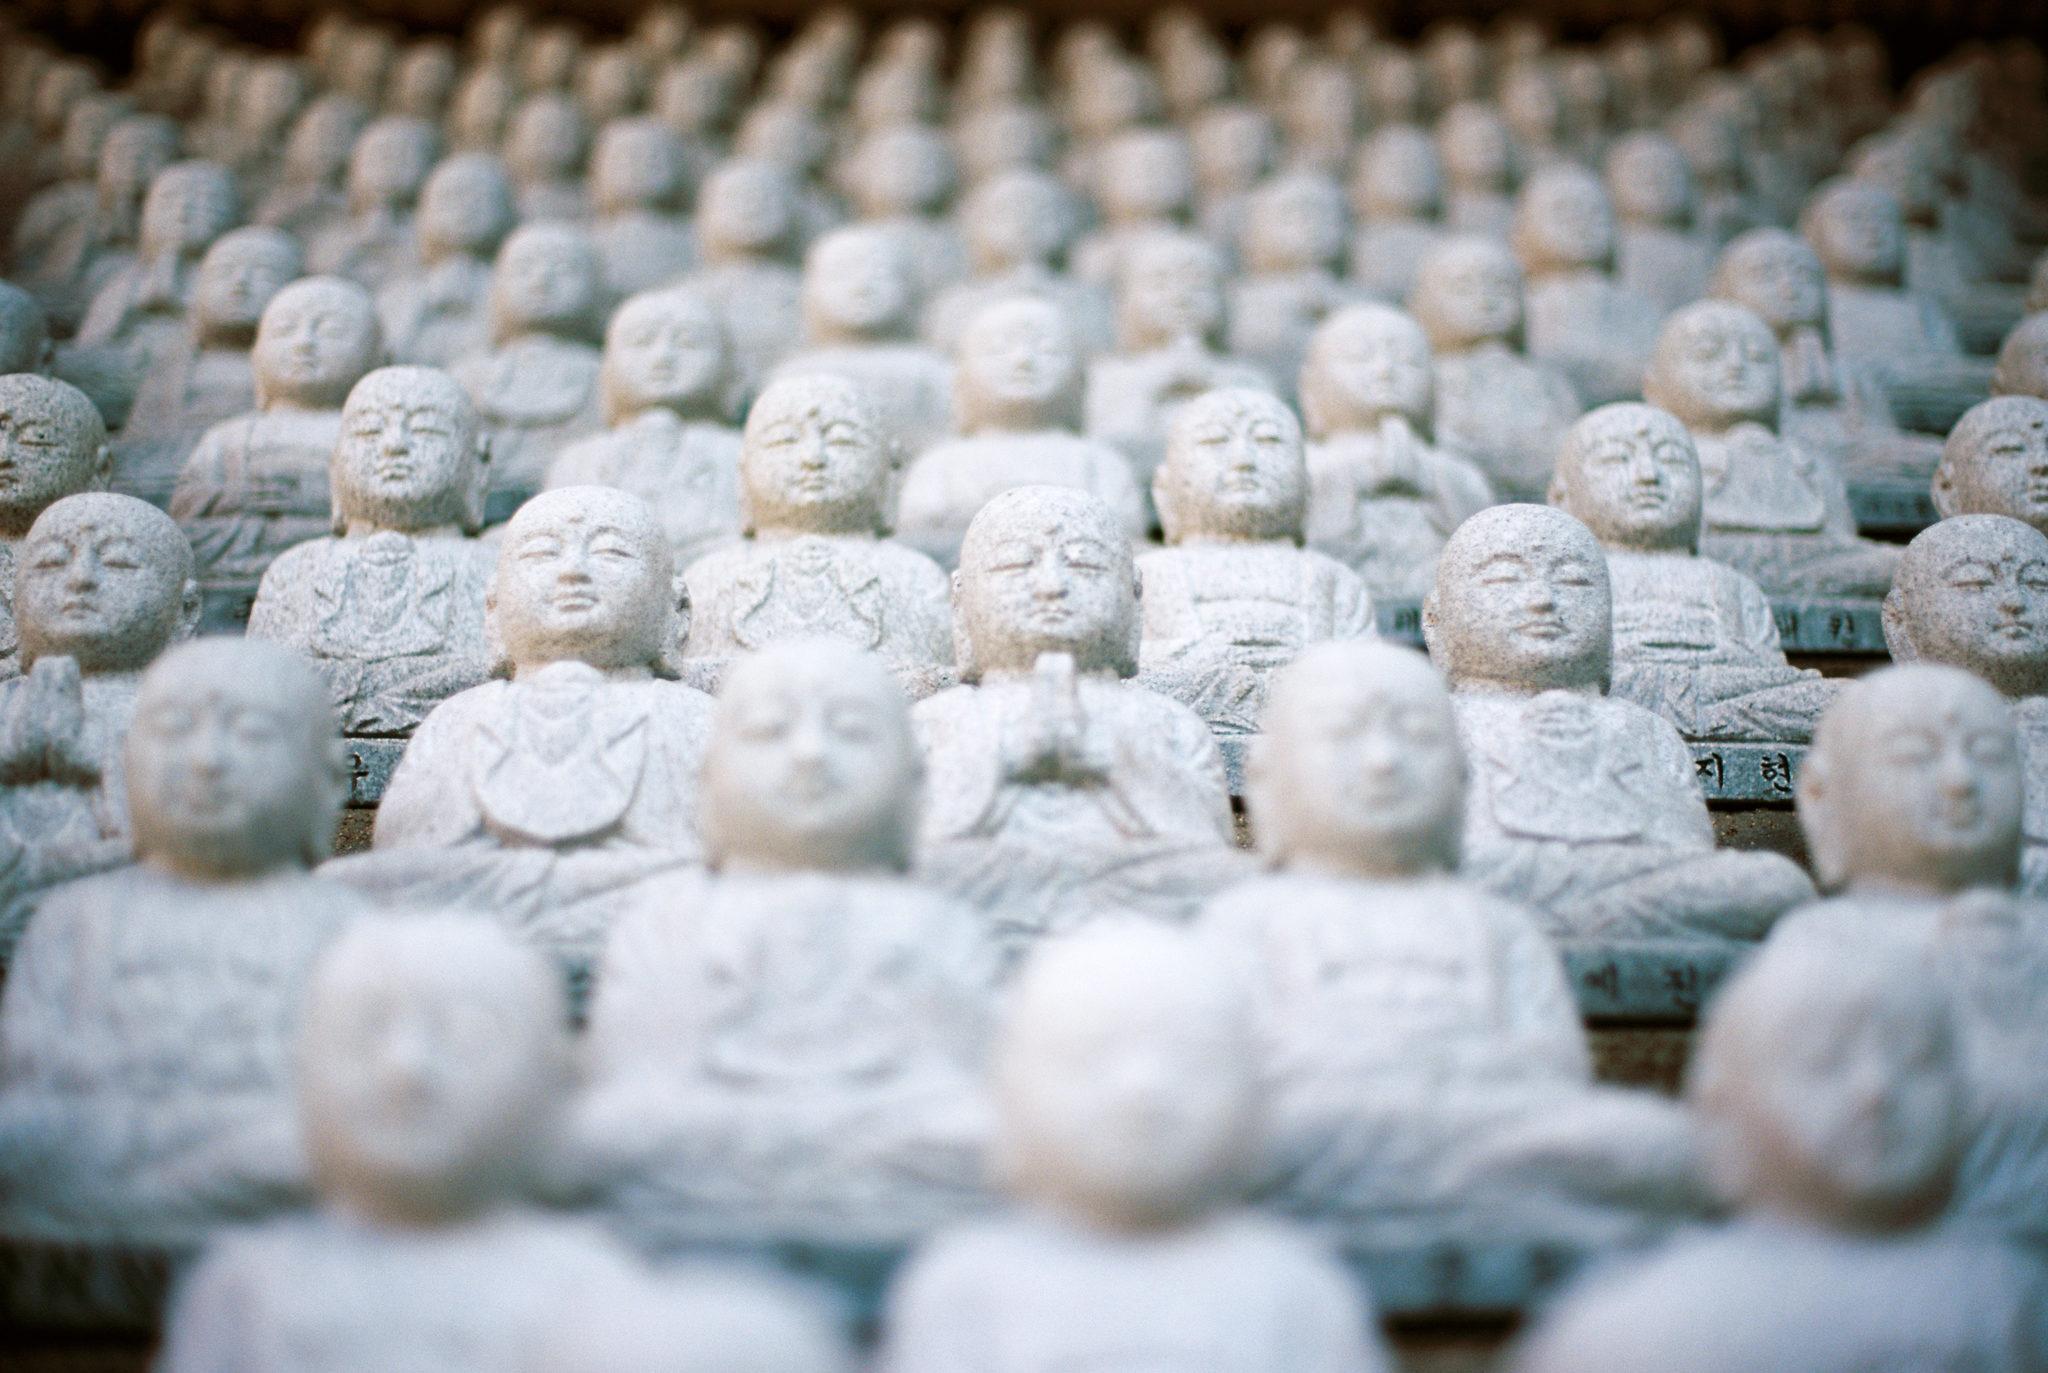 Buddha statues photo credit Jed Adan CC0